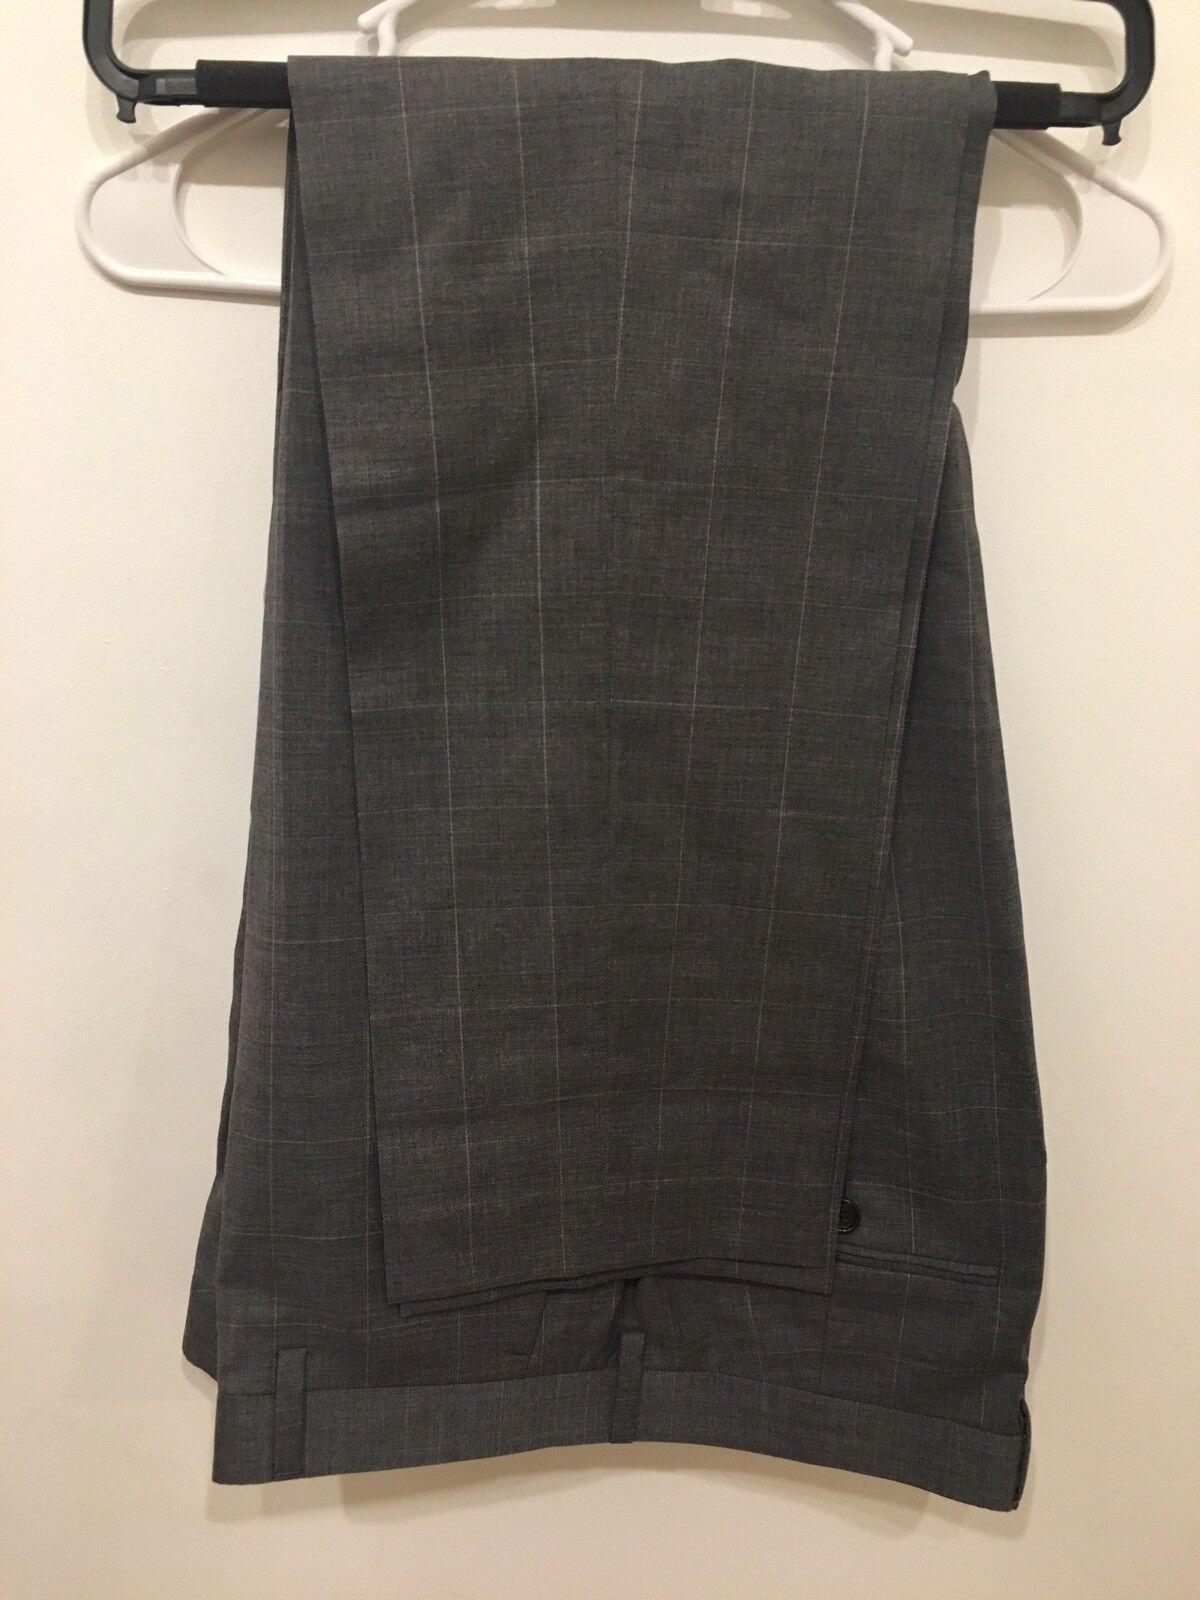 NEW J.Crew Men's Ludlow Slim-fit Suit Pant Steel Grey American Wool 33x32